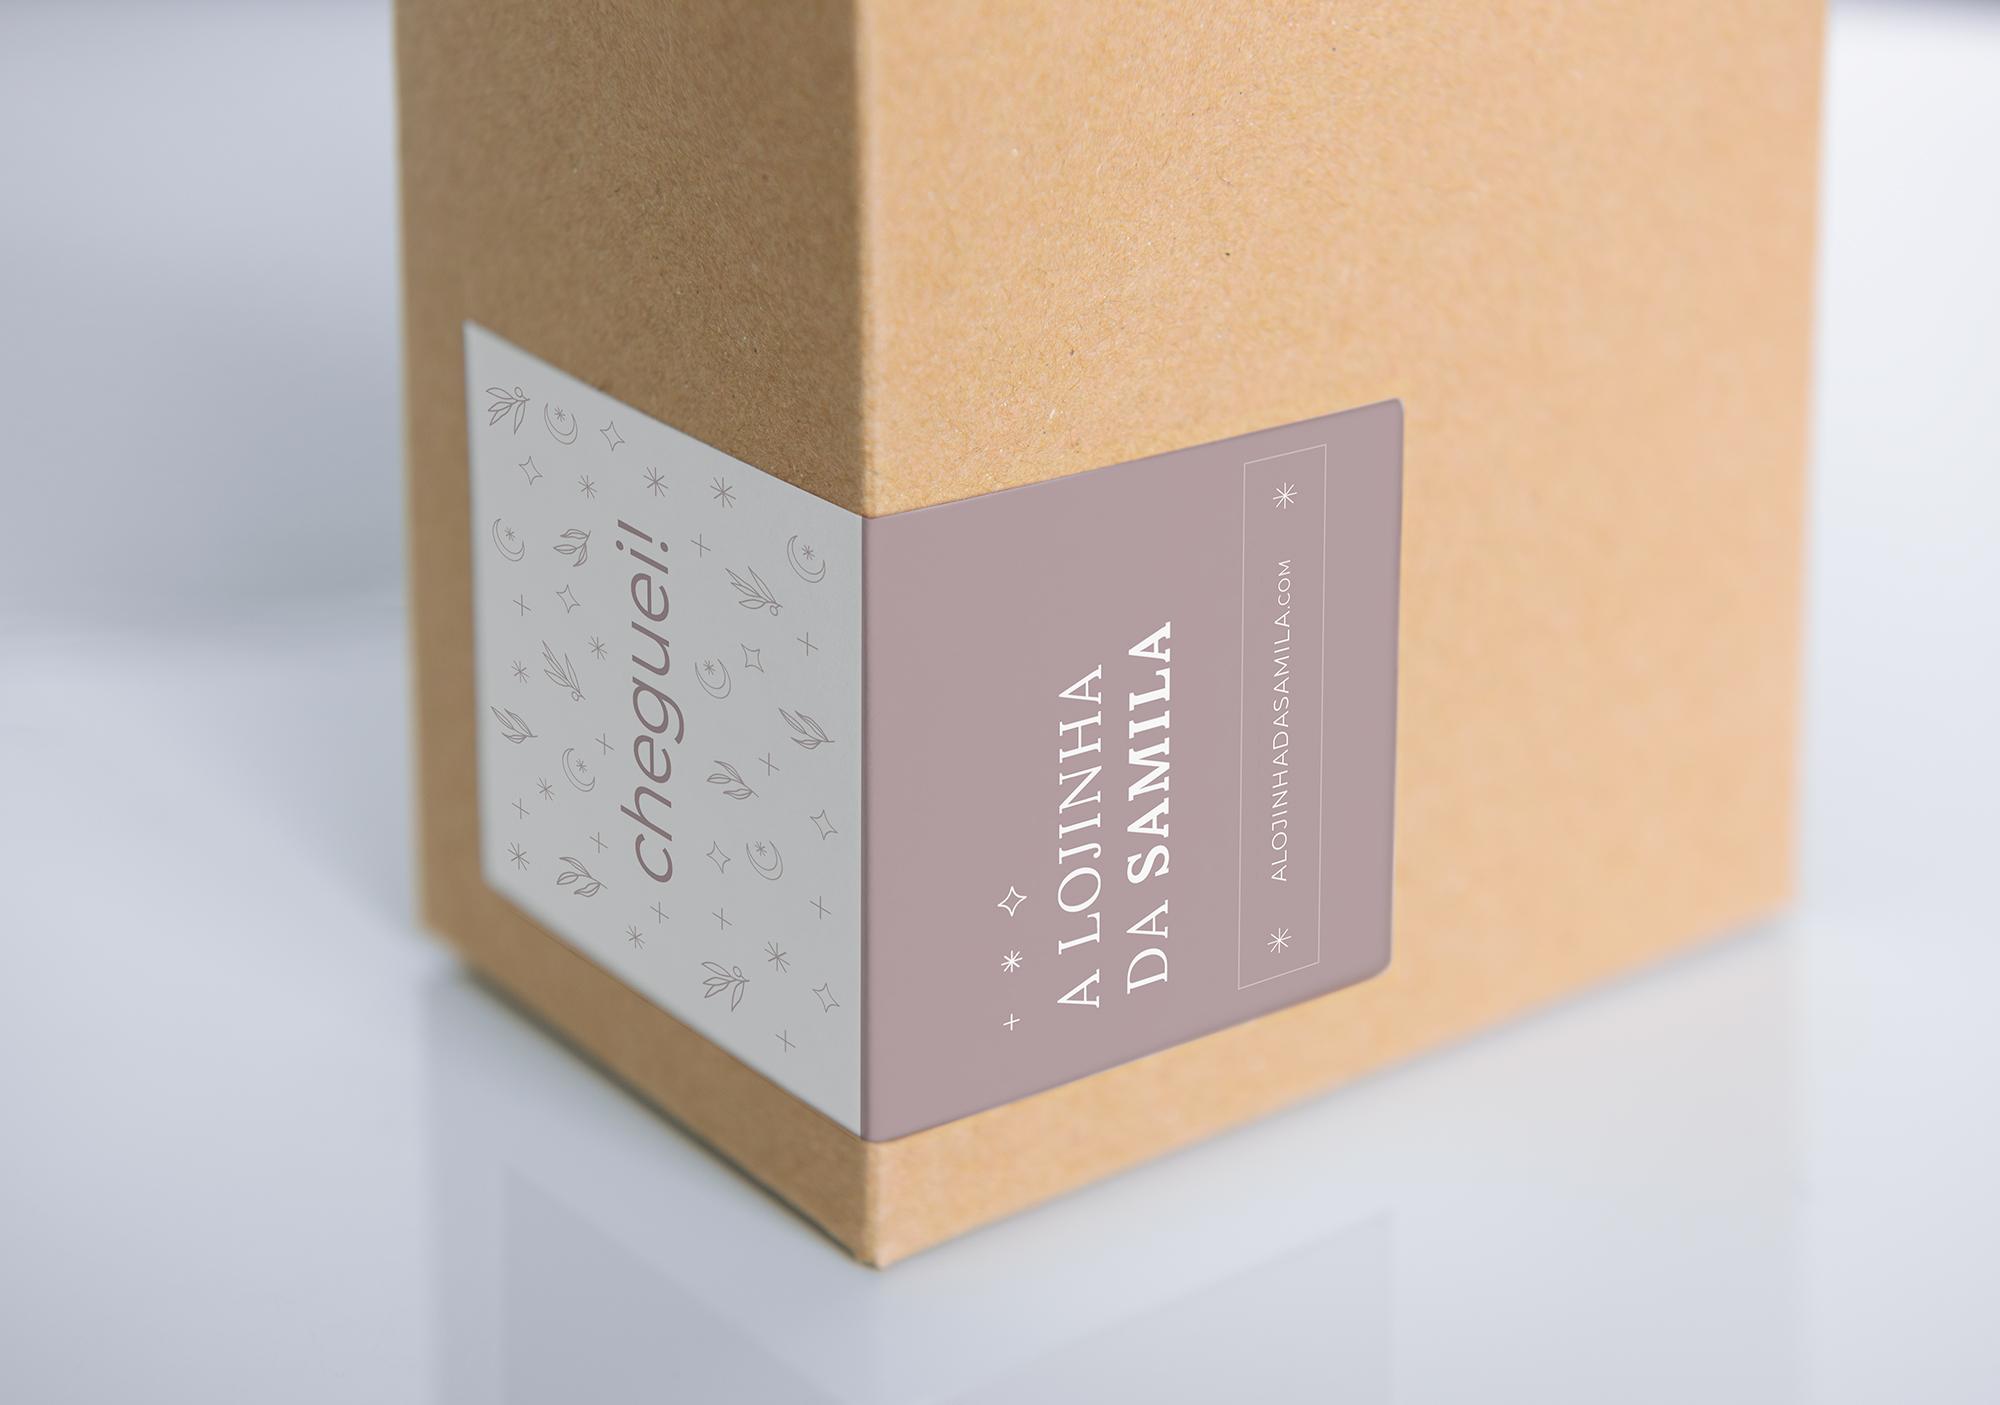 Identidade Visual e Layout para Loja Online exclusiva para A Lojinha da Samila - Design by Adrielly Sato